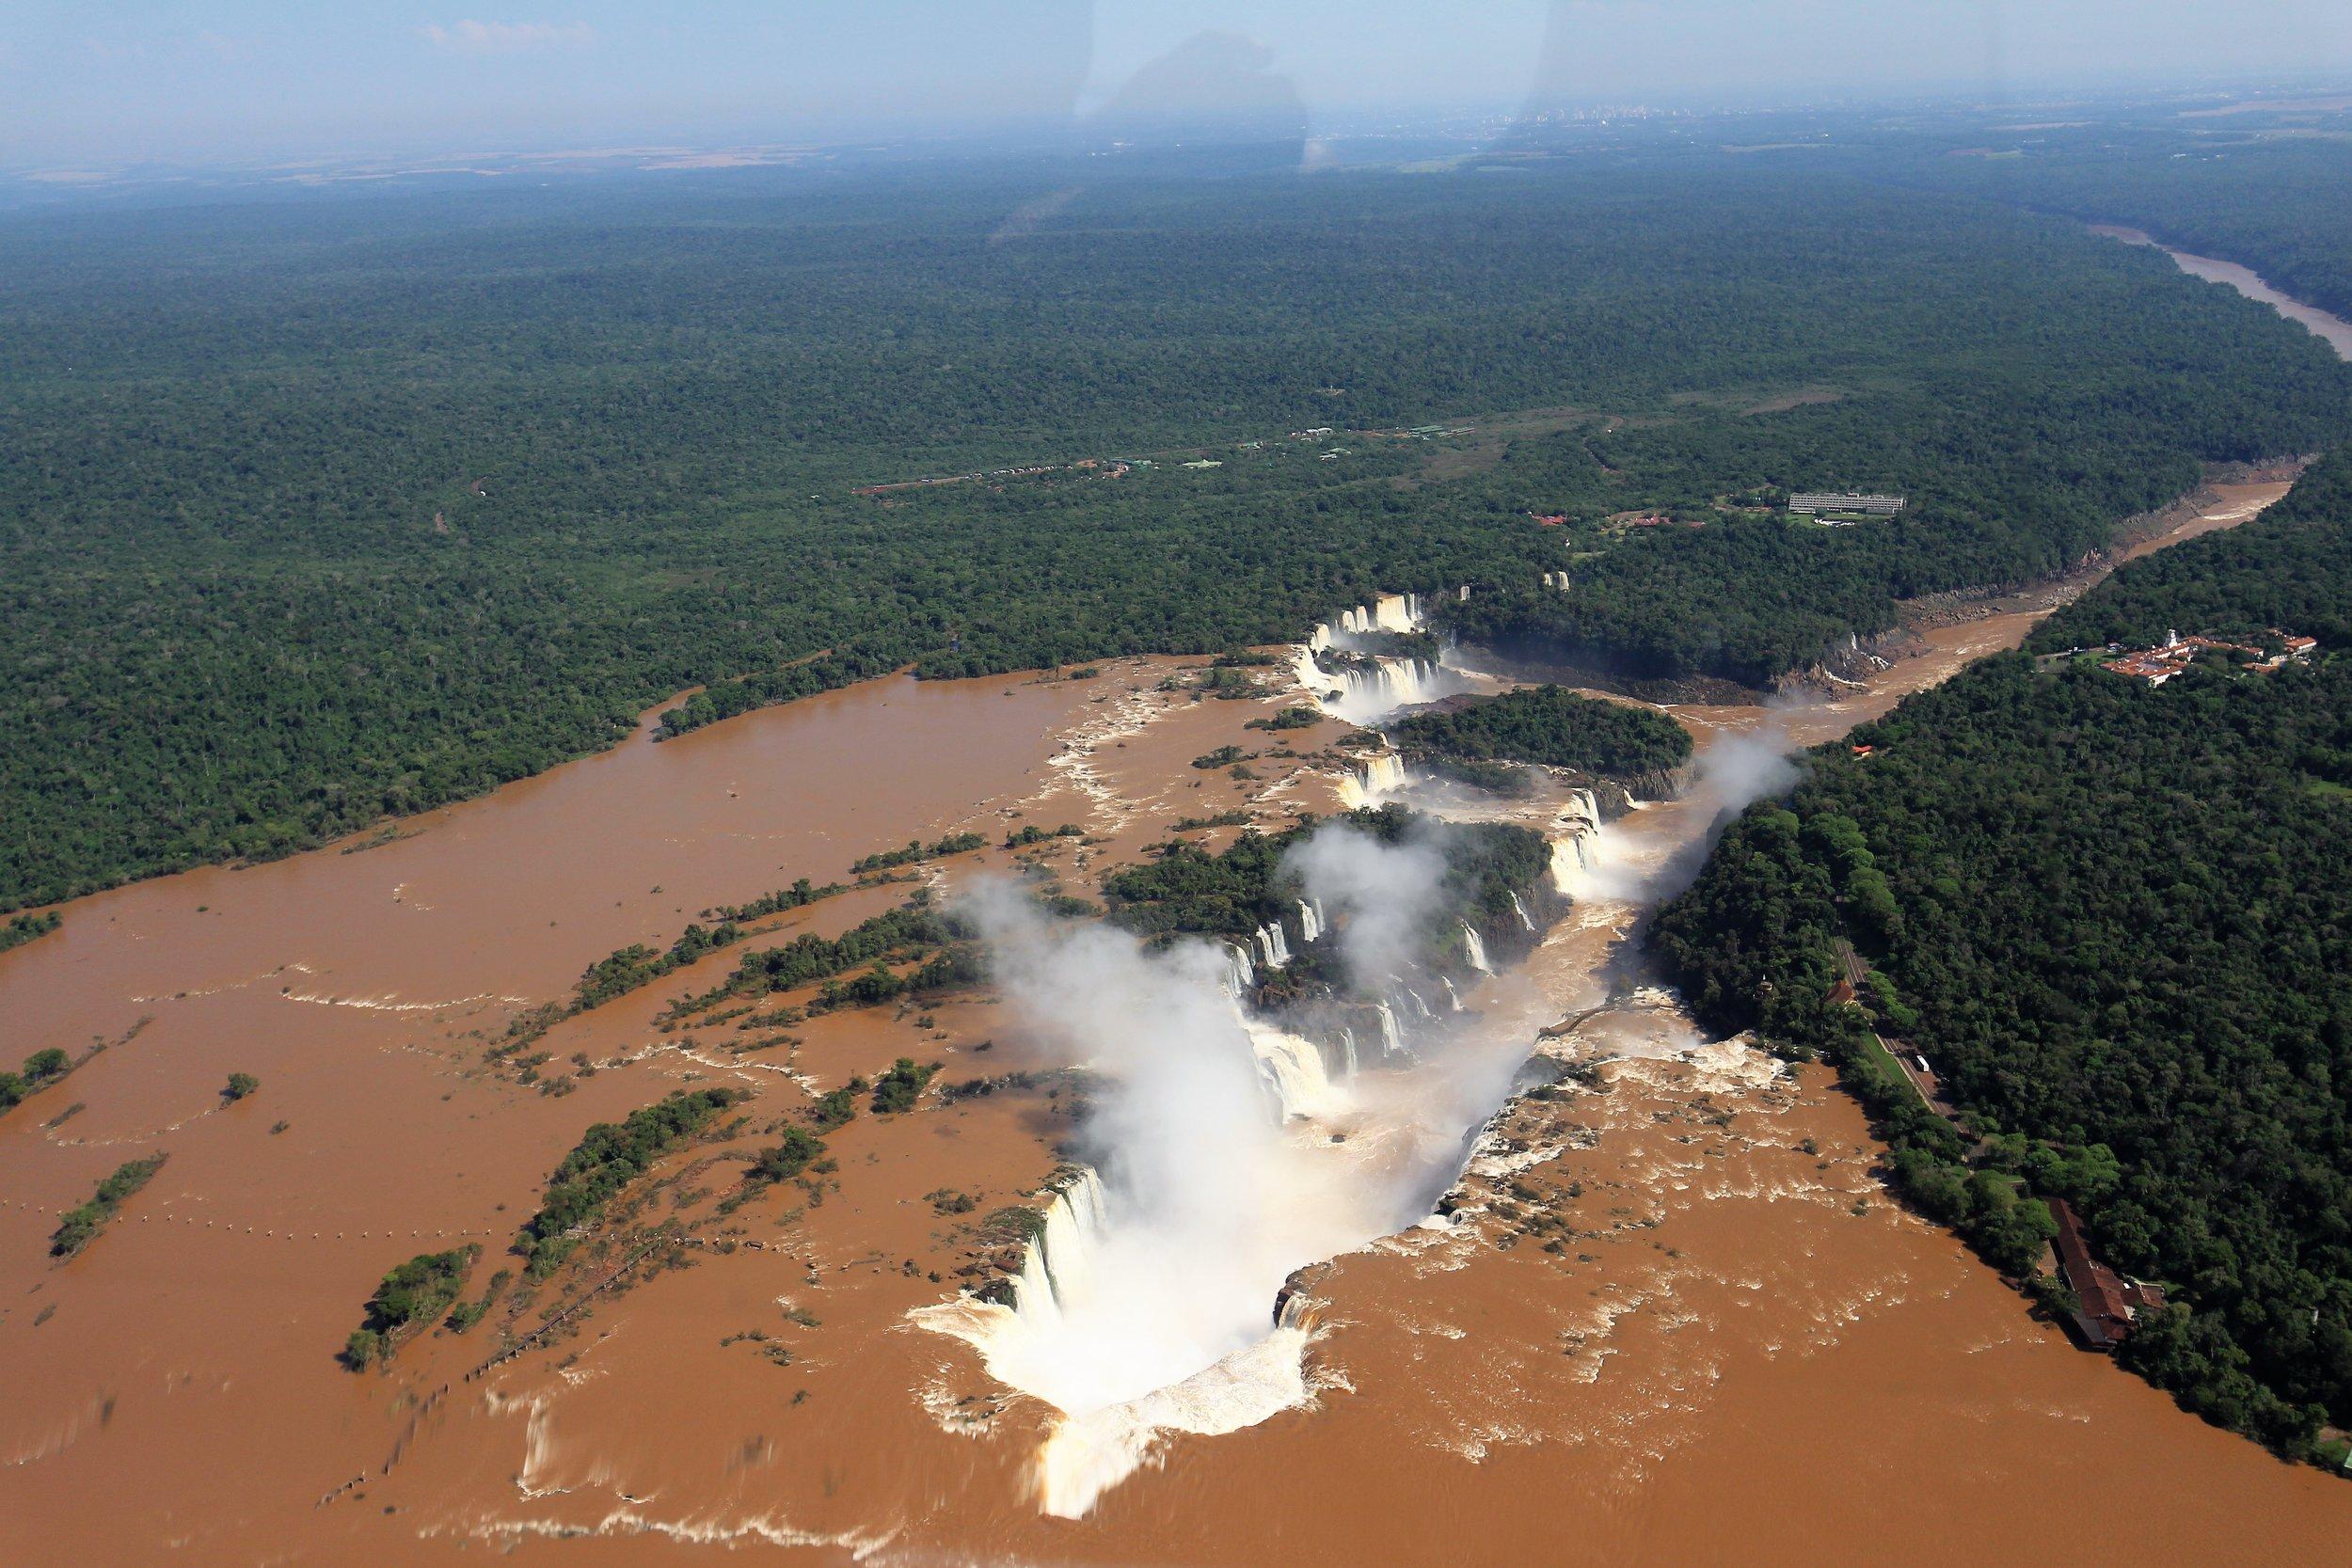 Iguazu falls by helicopter